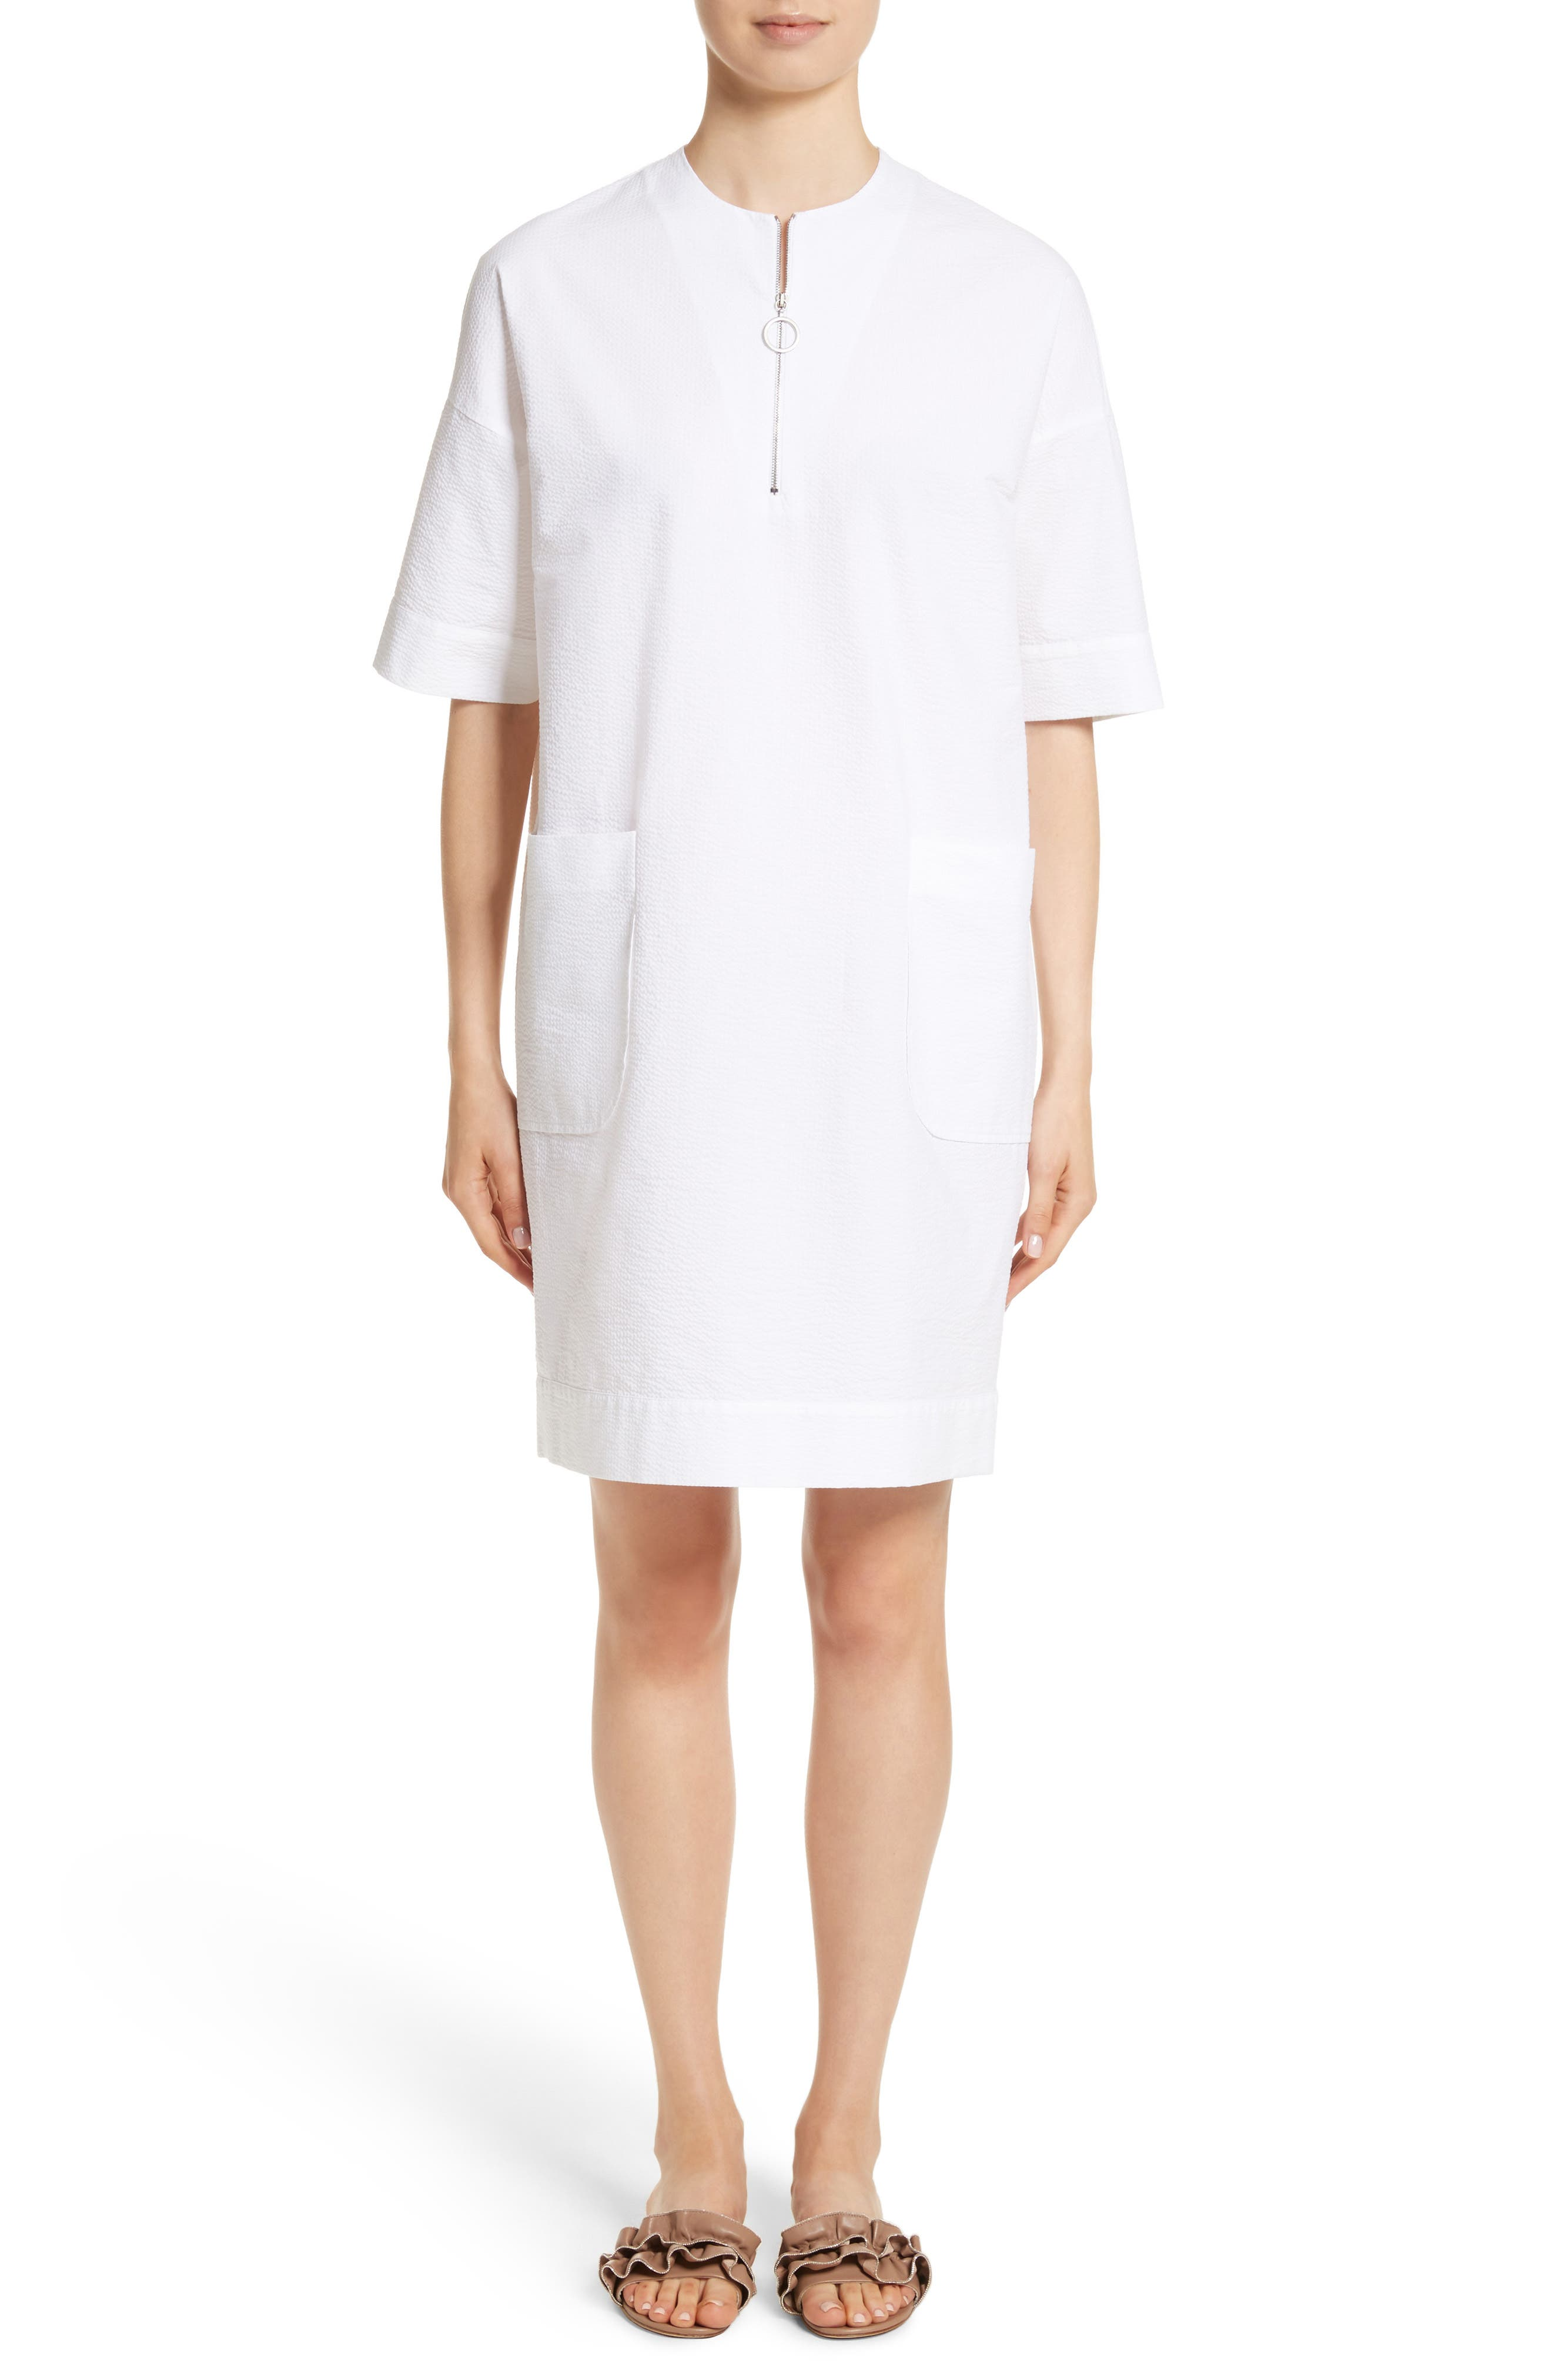 Alternate Image 1 Selected - Fabiana Filippi Seersucker Shift Dress